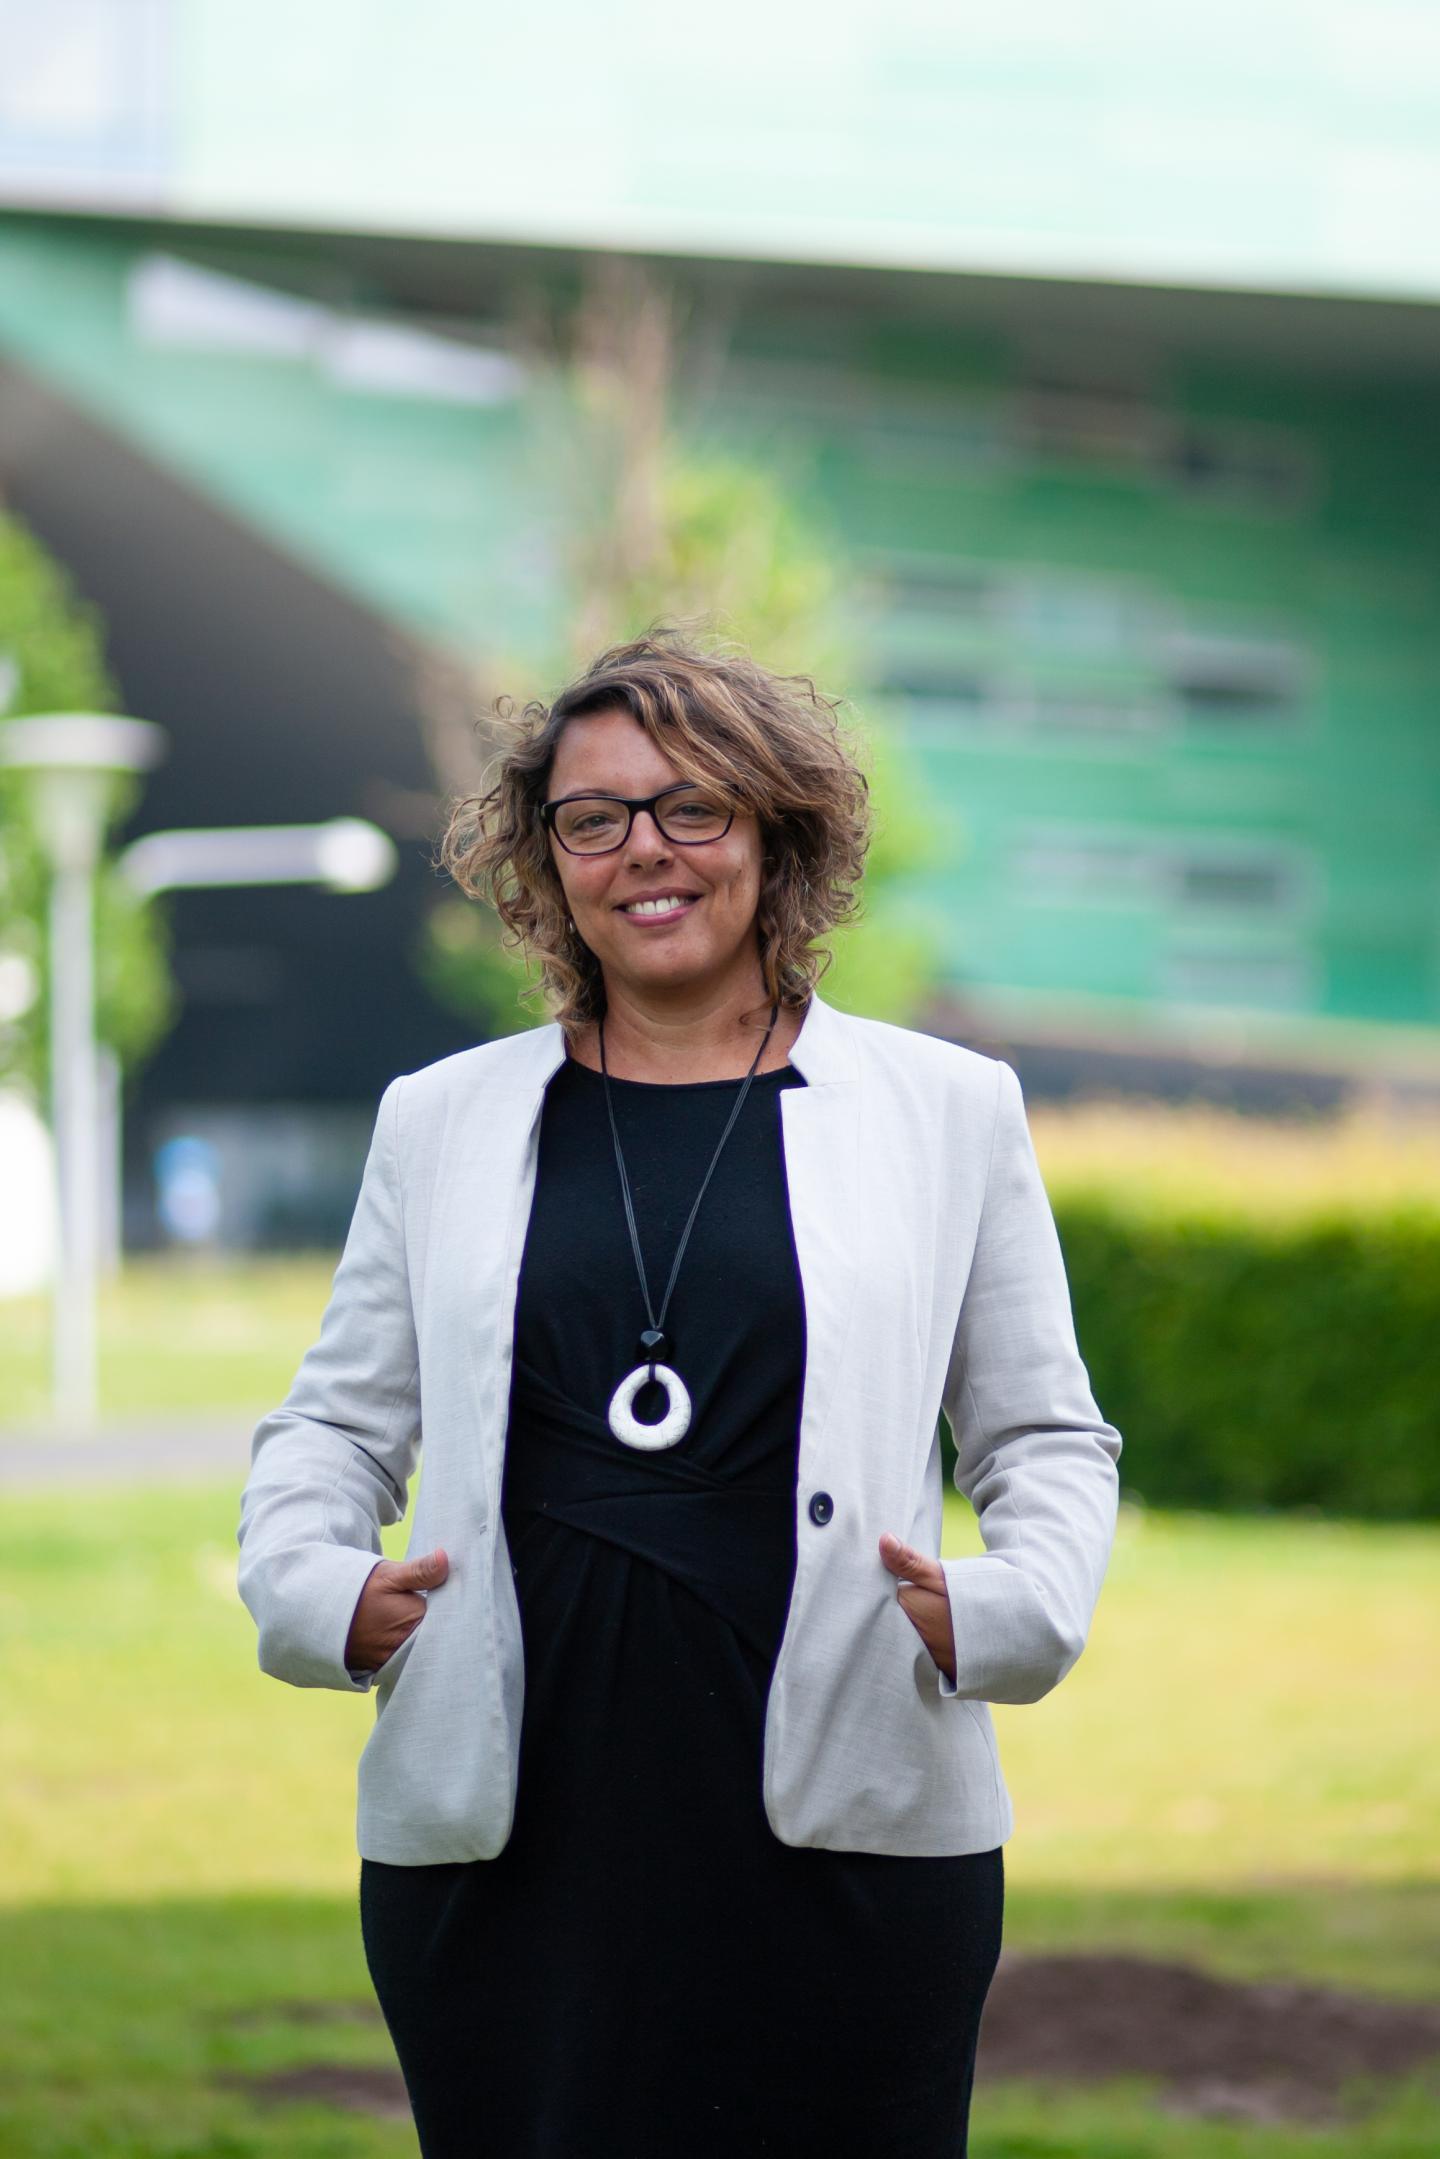 Professor of Microbial Community Ecology Joana Falcao Salles